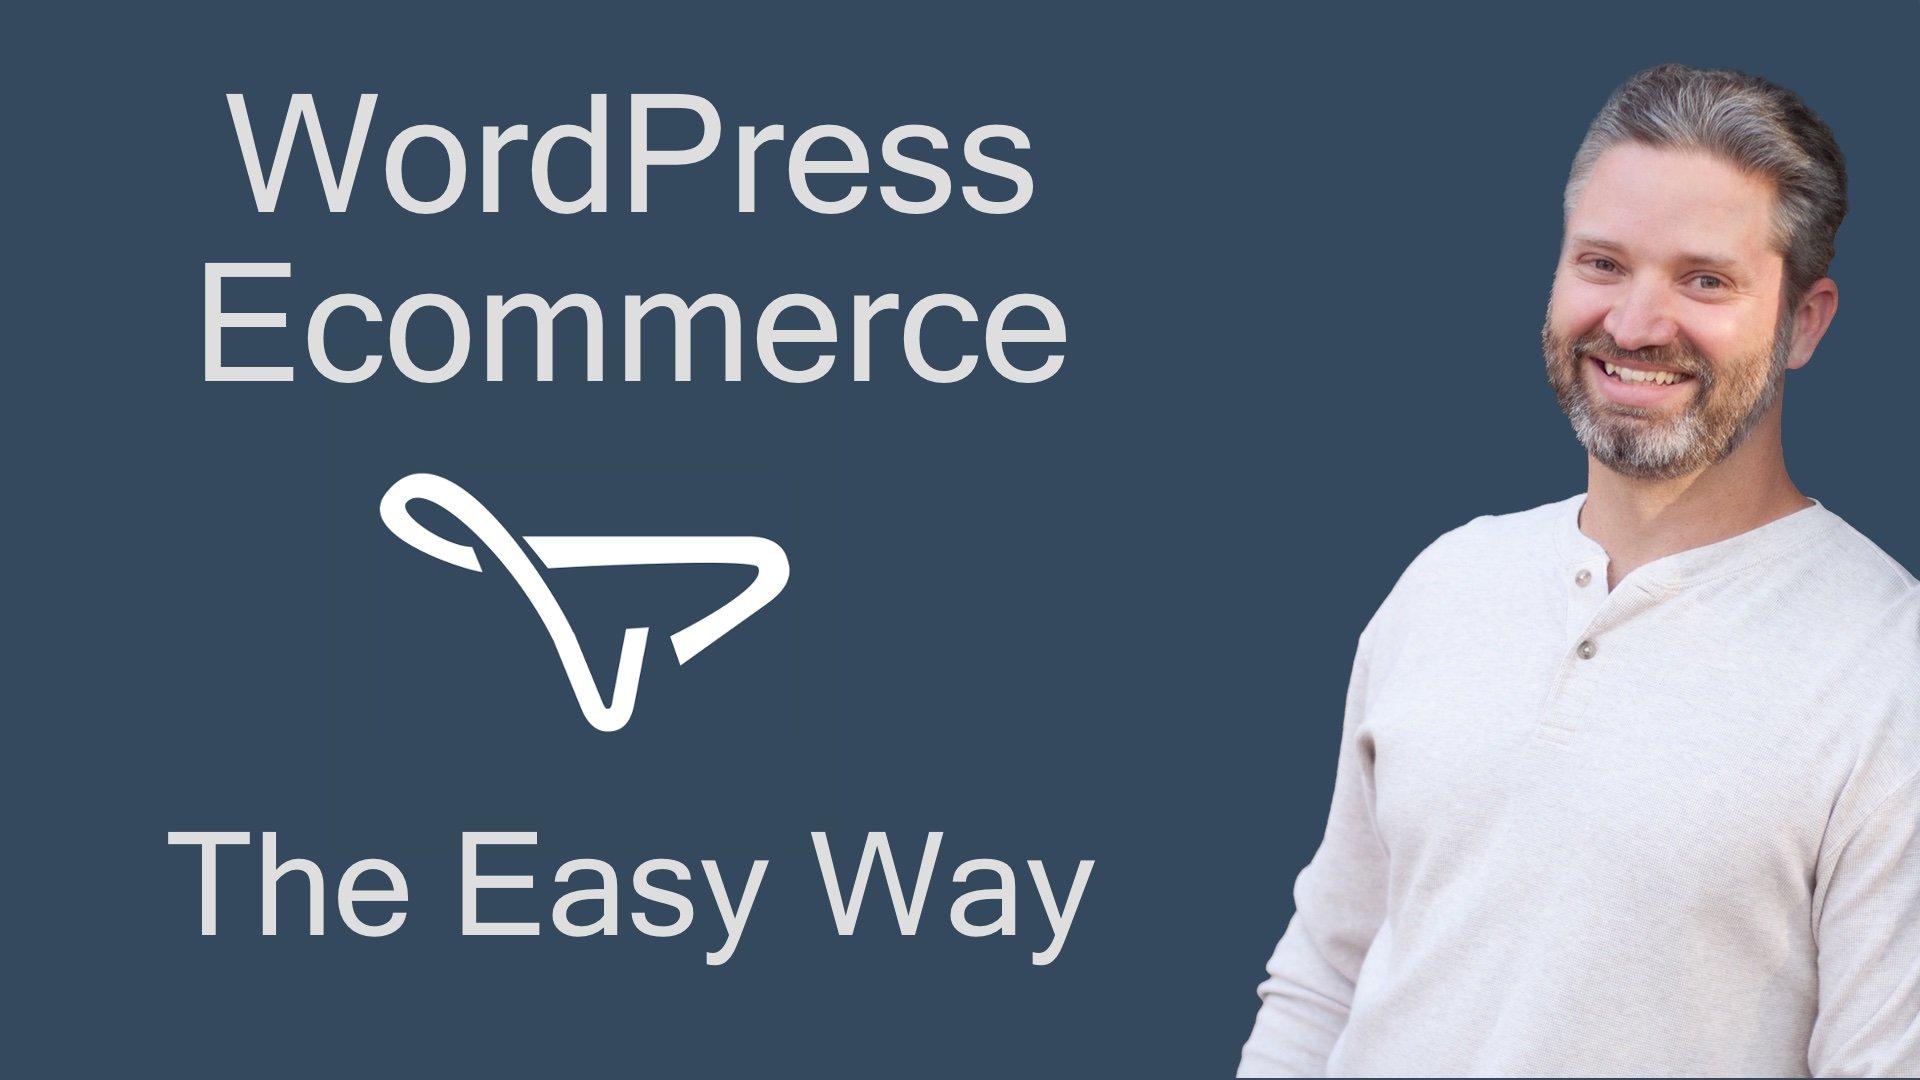 WordPress Ecommerce - The Easy Way